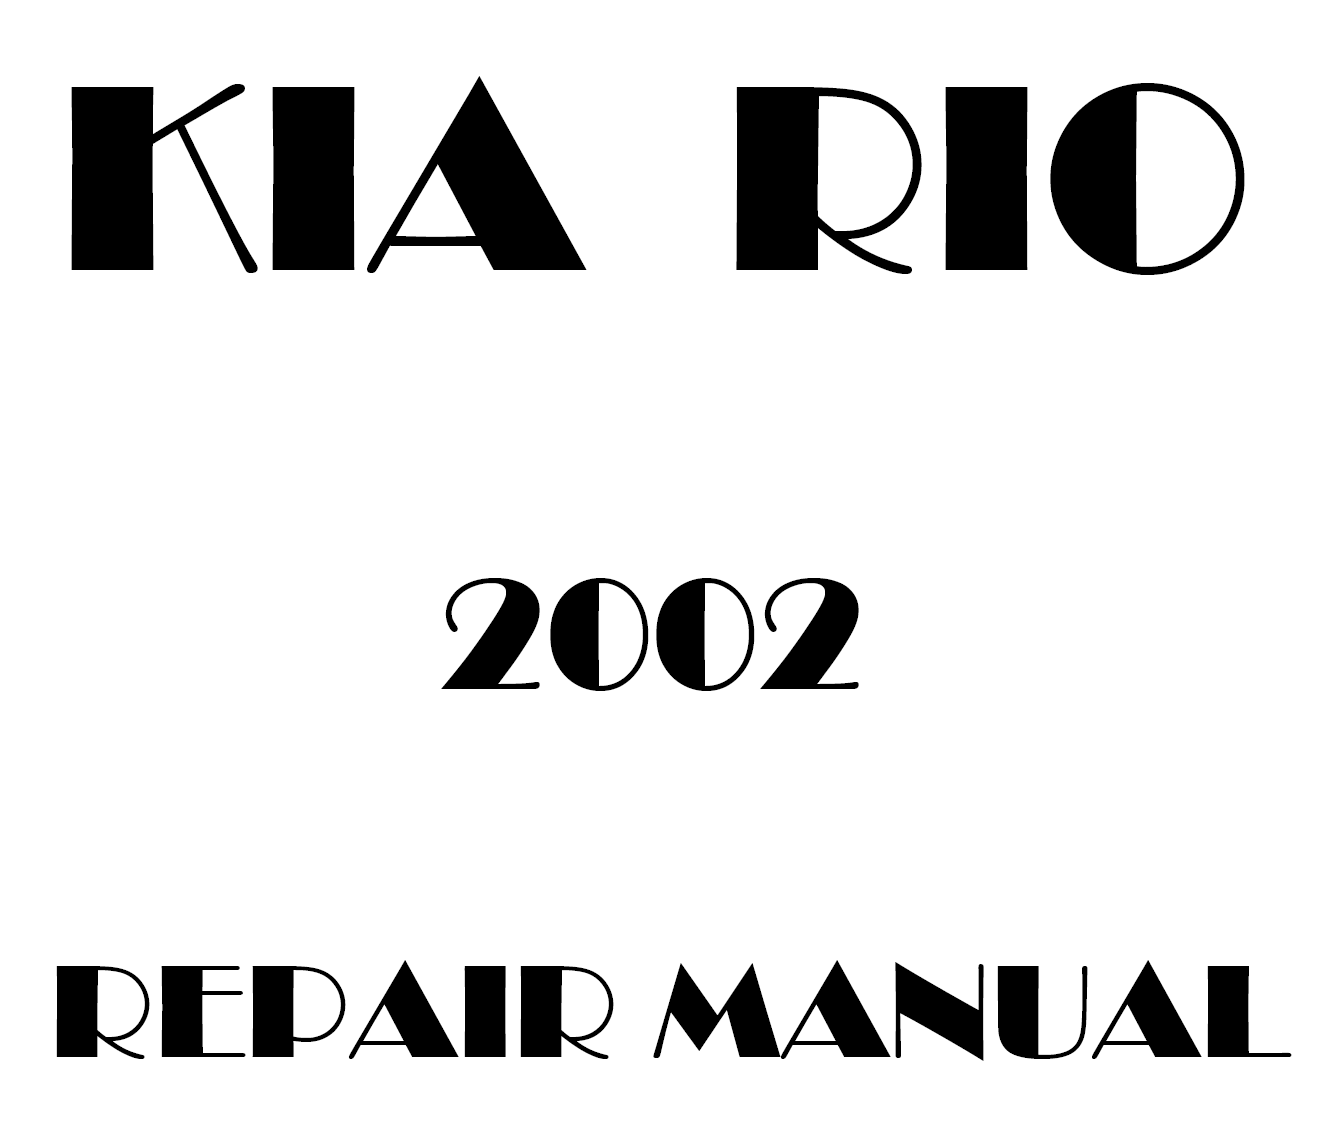 2002 Kia Rio repair manual